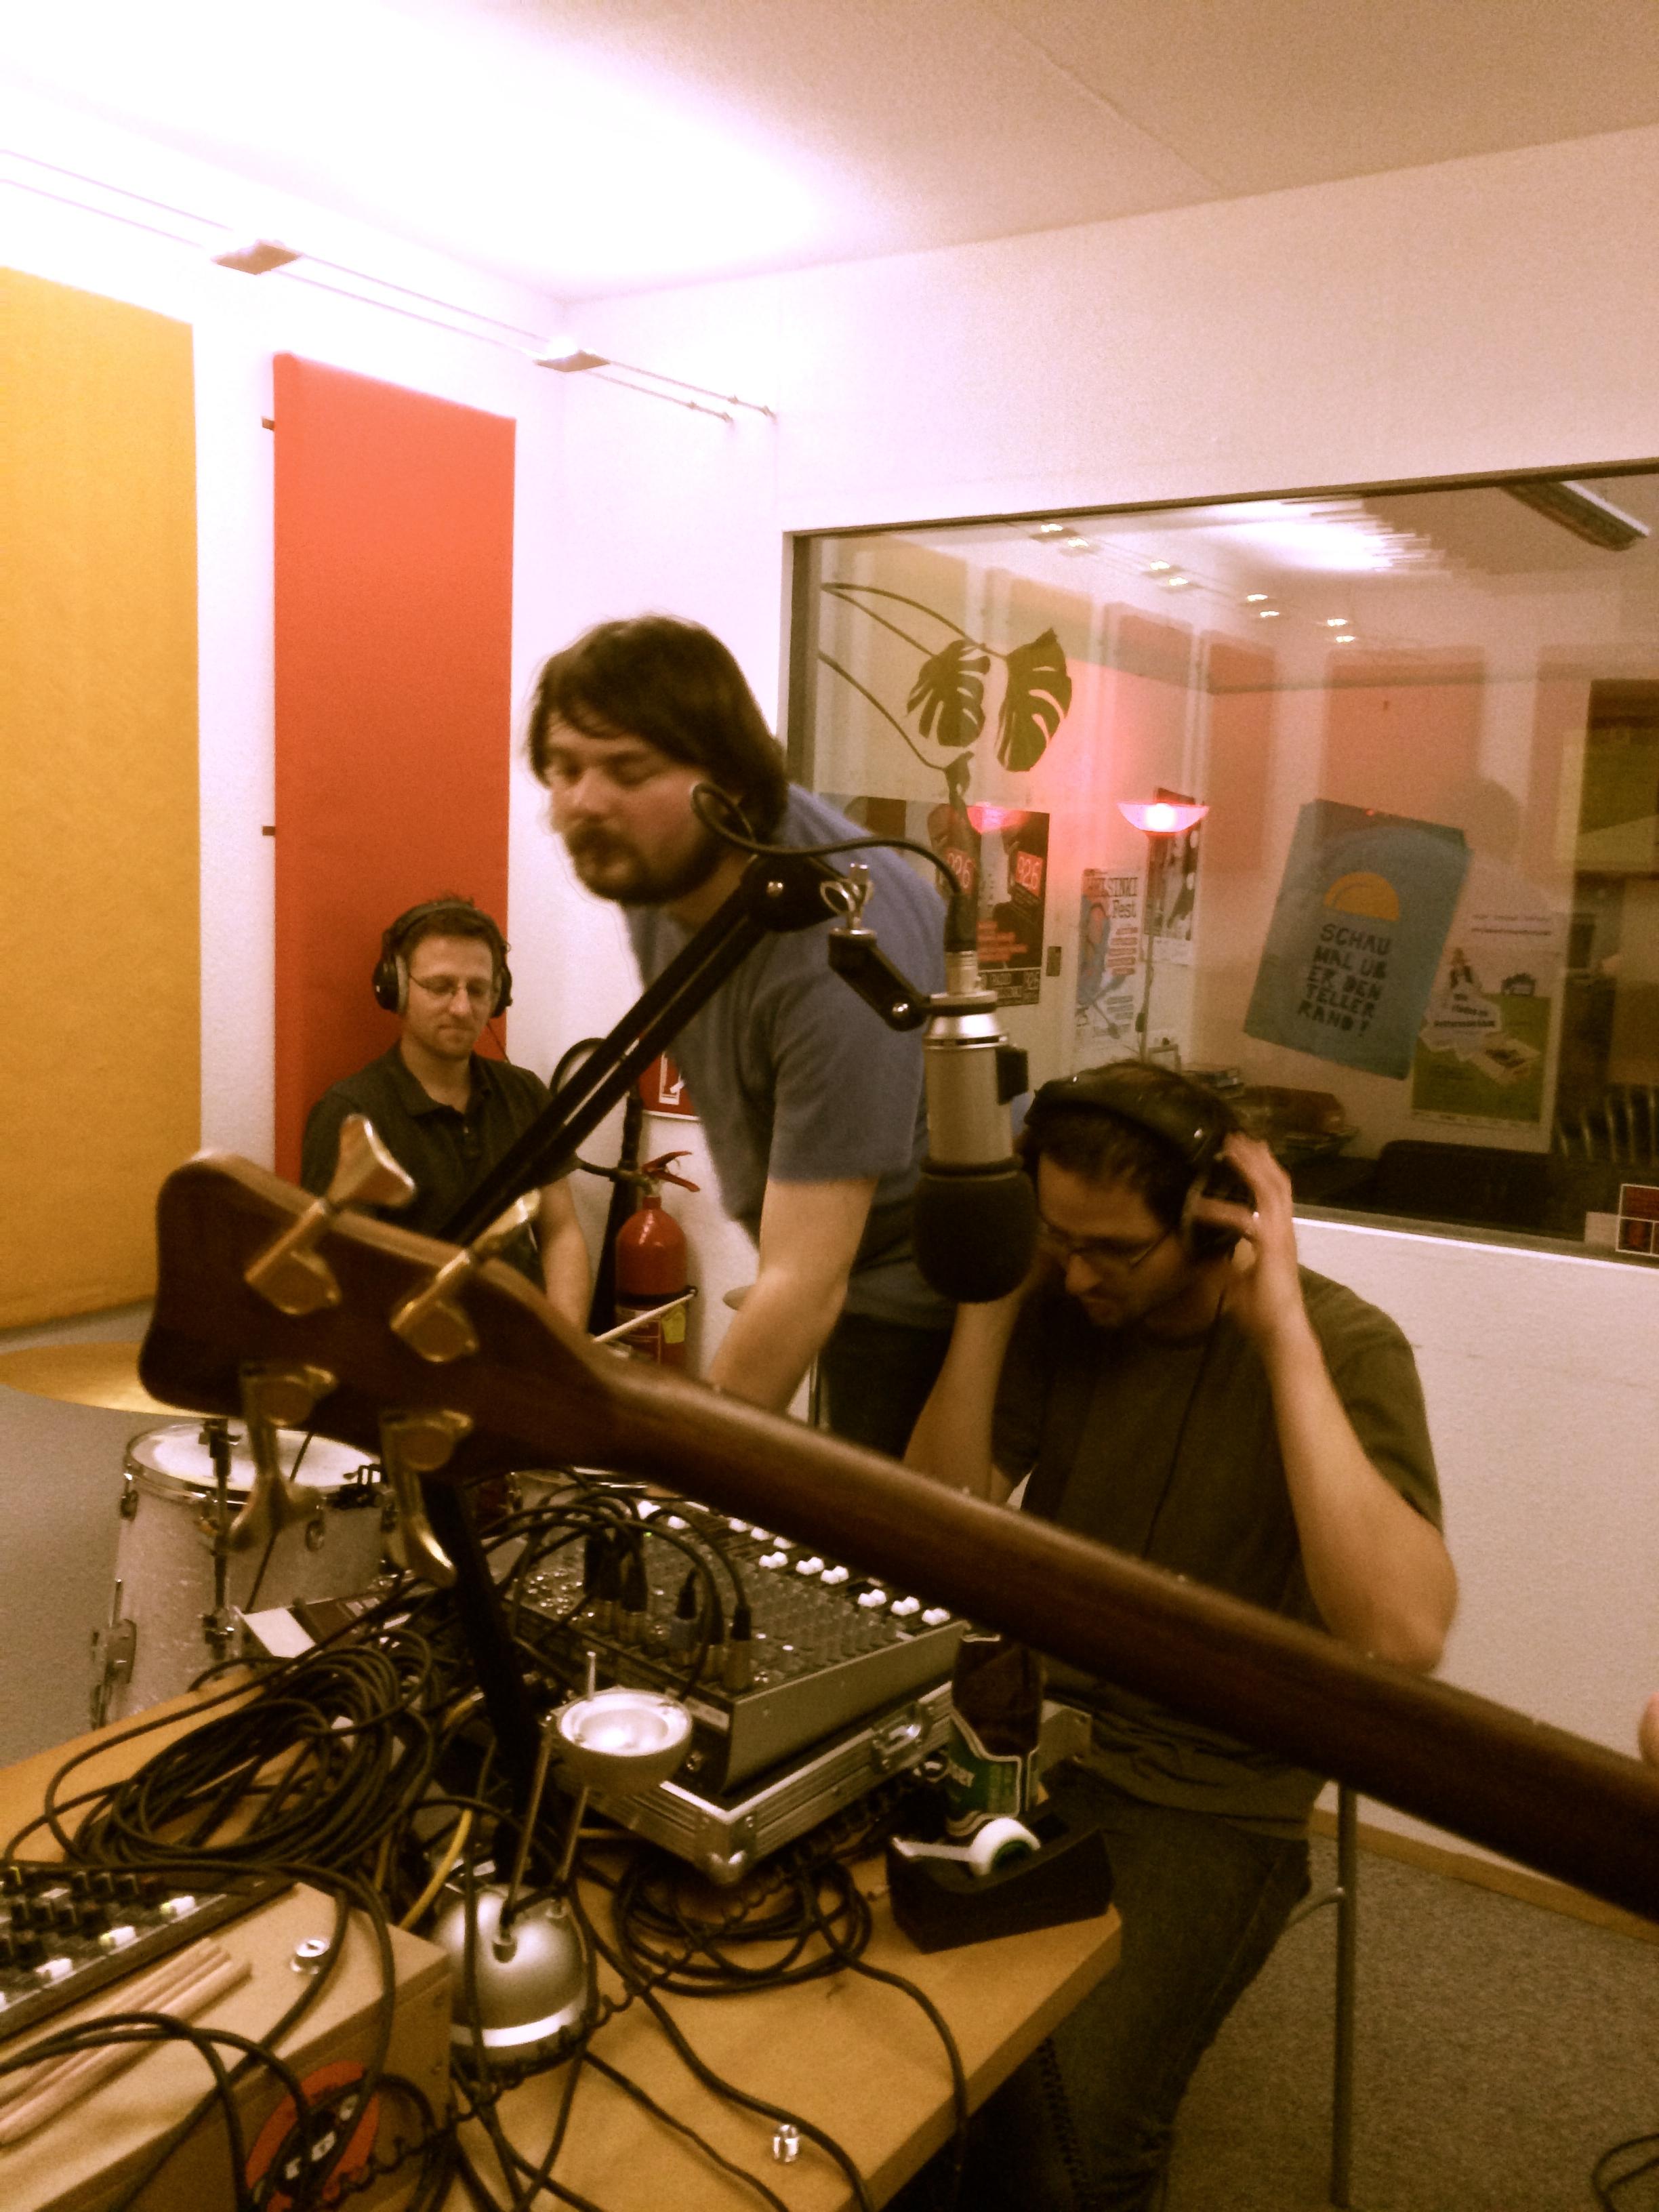 Radio Helsinki sound techs Christian and Josef hard at work